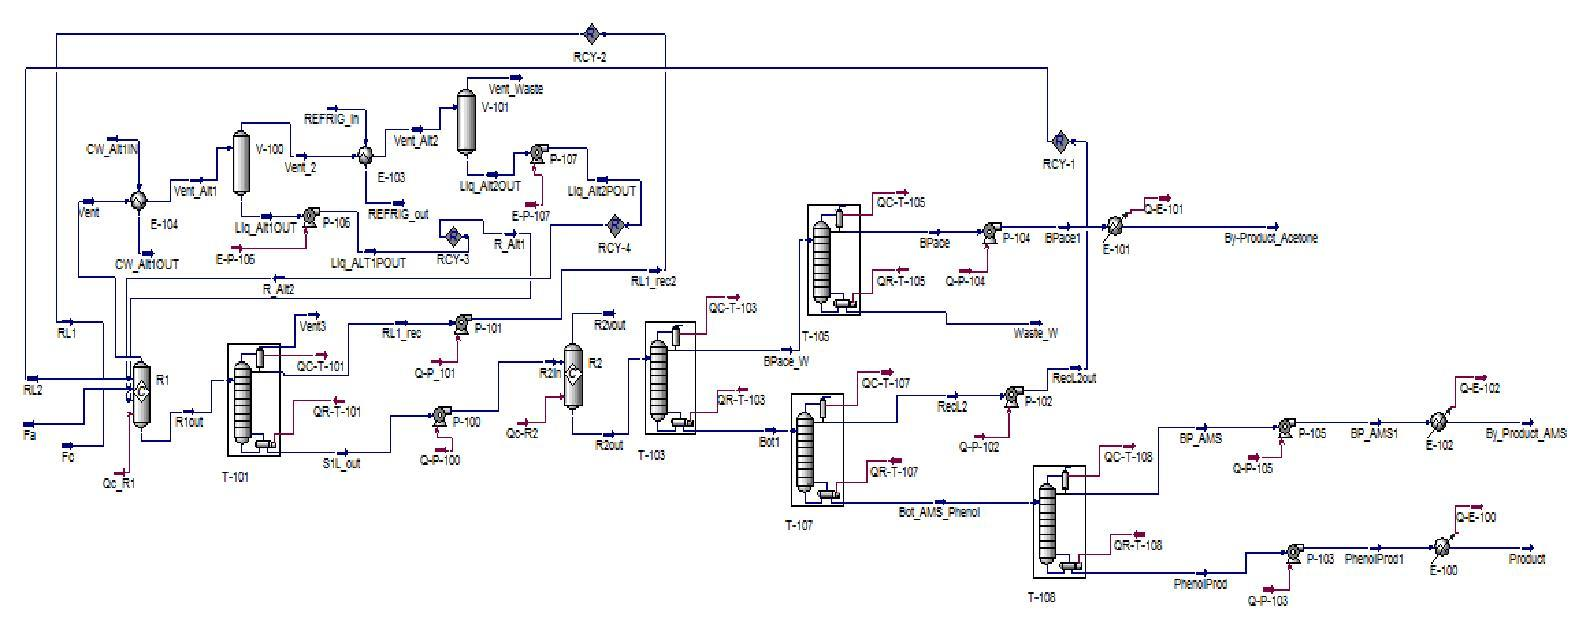 process flow diagram acetone wiring diagram schemes. Black Bedroom Furniture Sets. Home Design Ideas